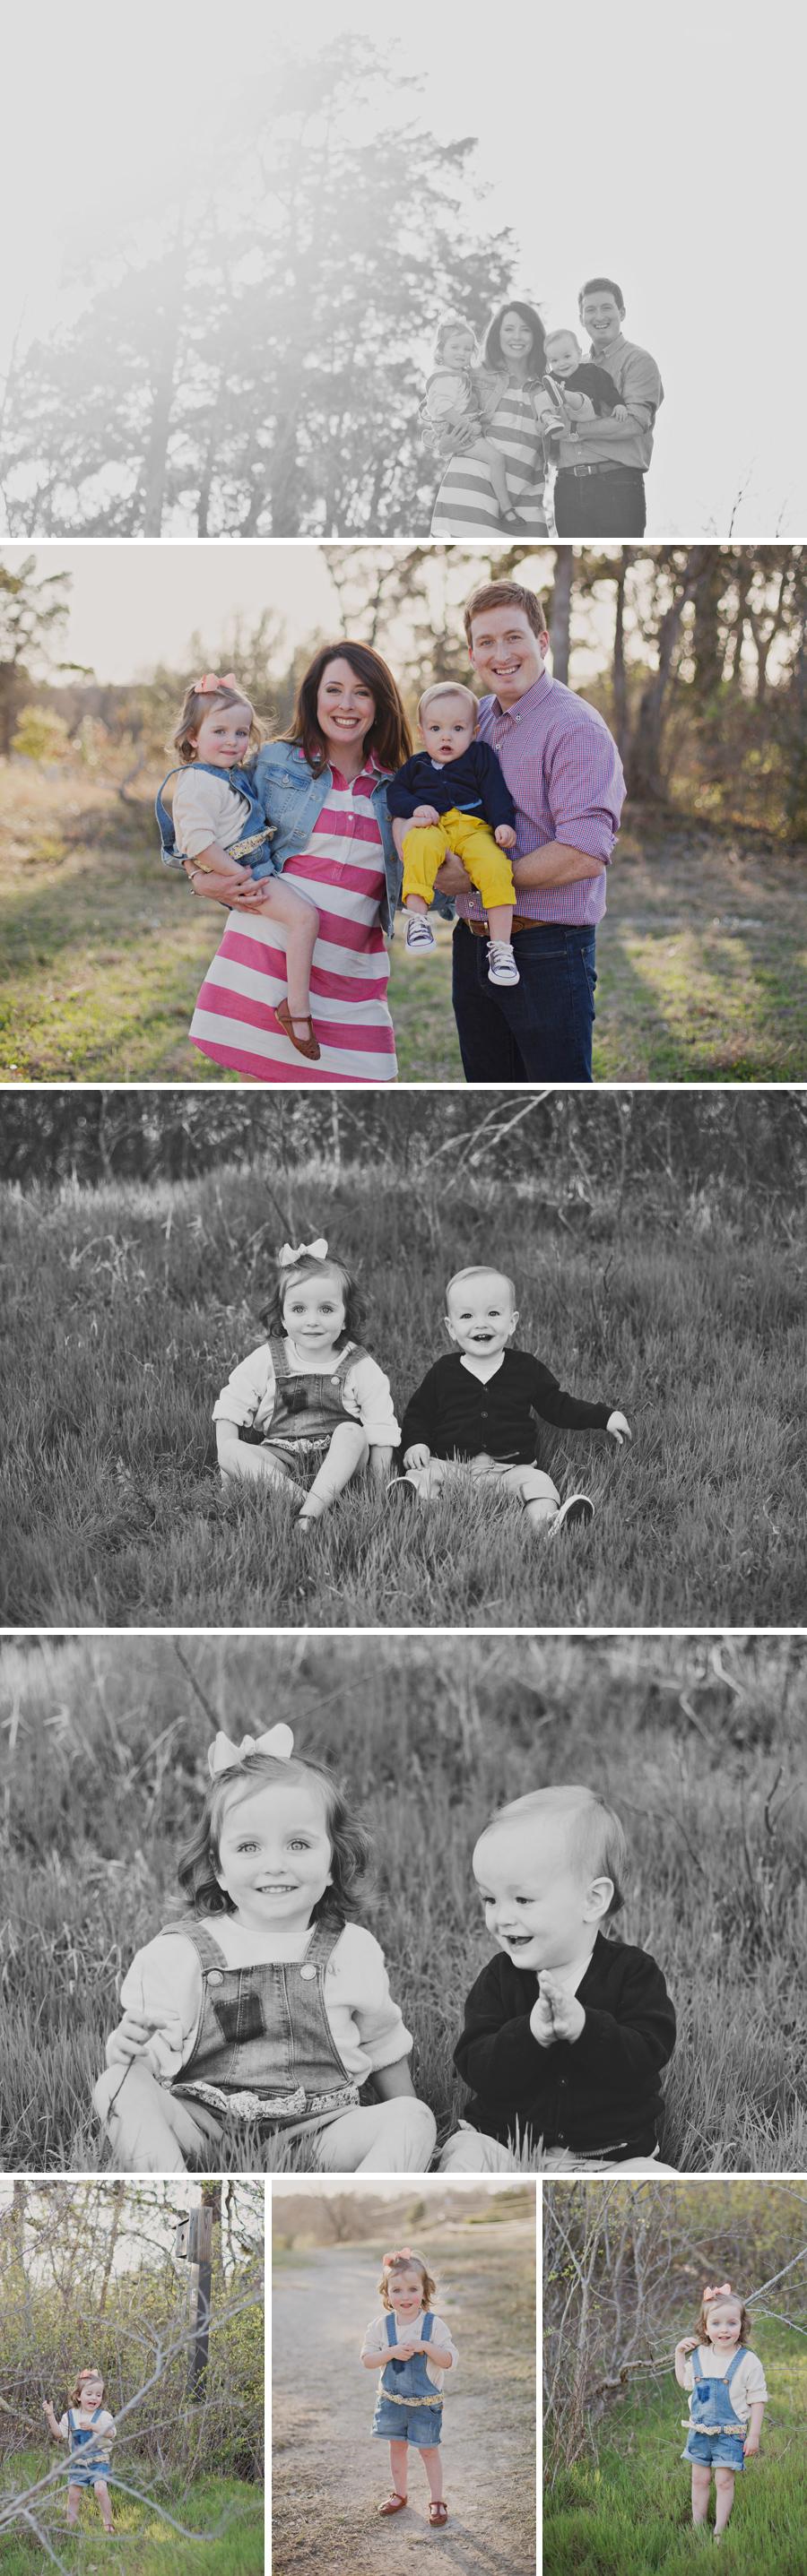 Dallas-Family-Photographerc018